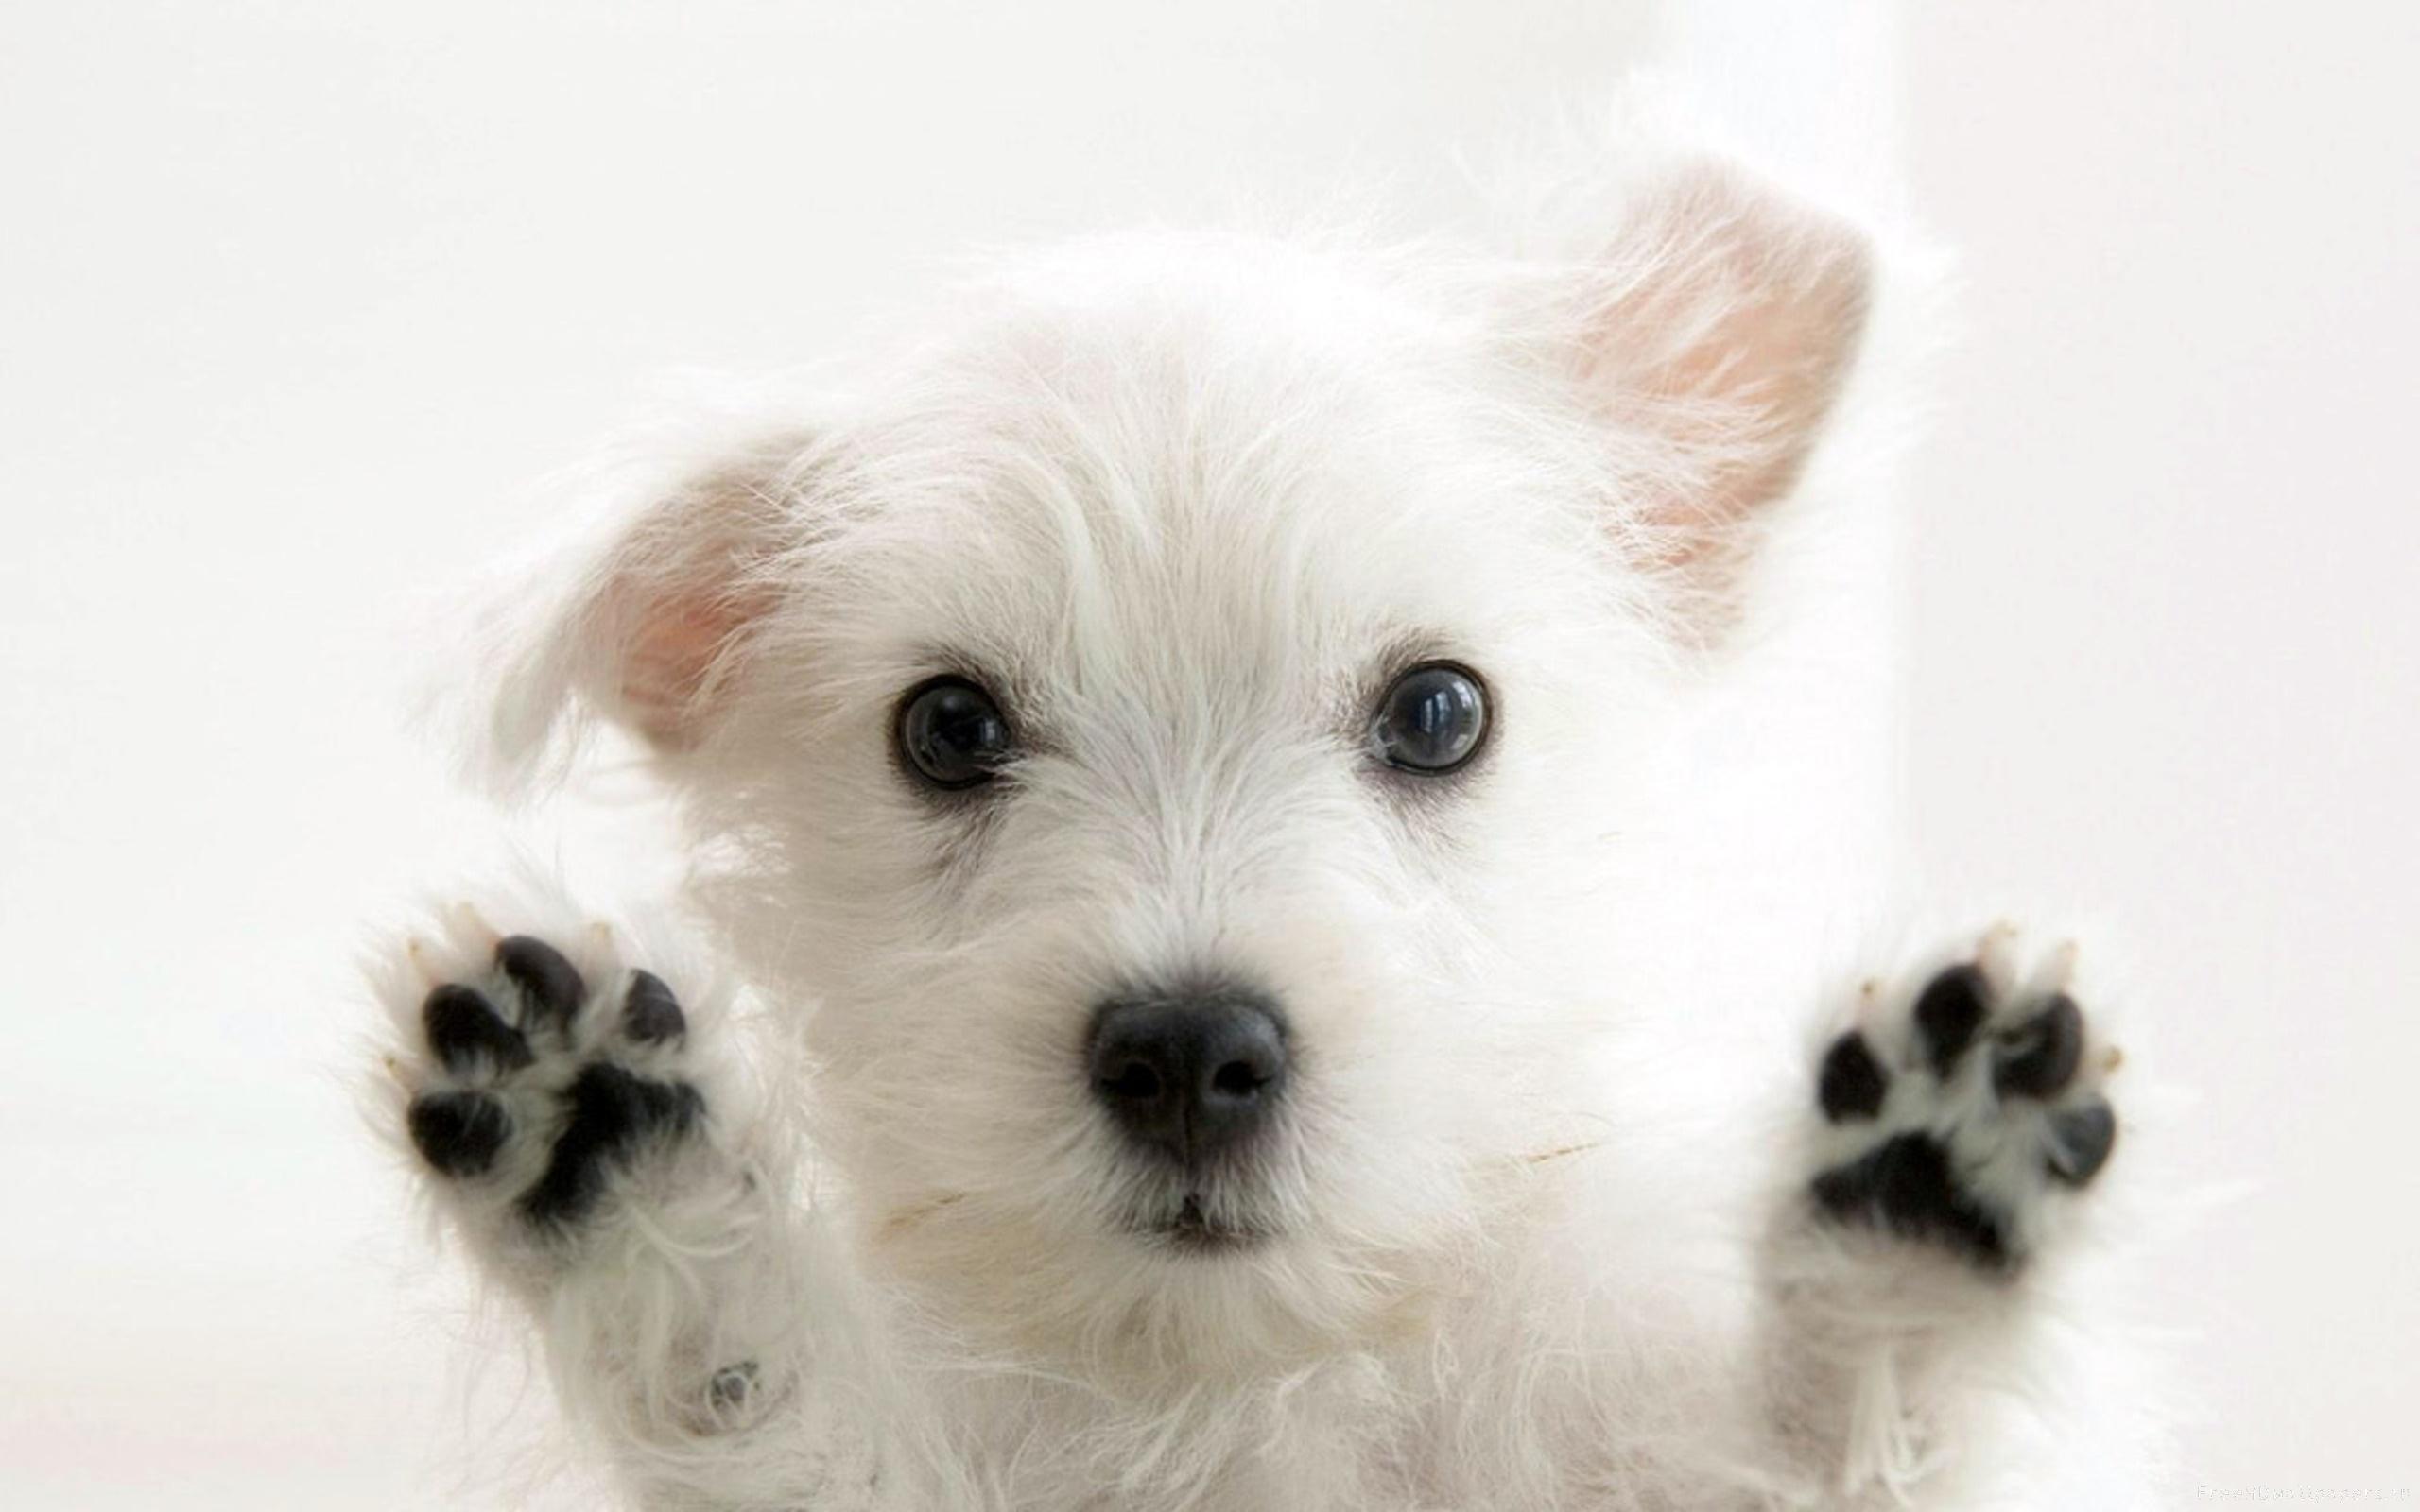 Cute Baby Dog. Cute Baby Dog Wallpaper HD ...